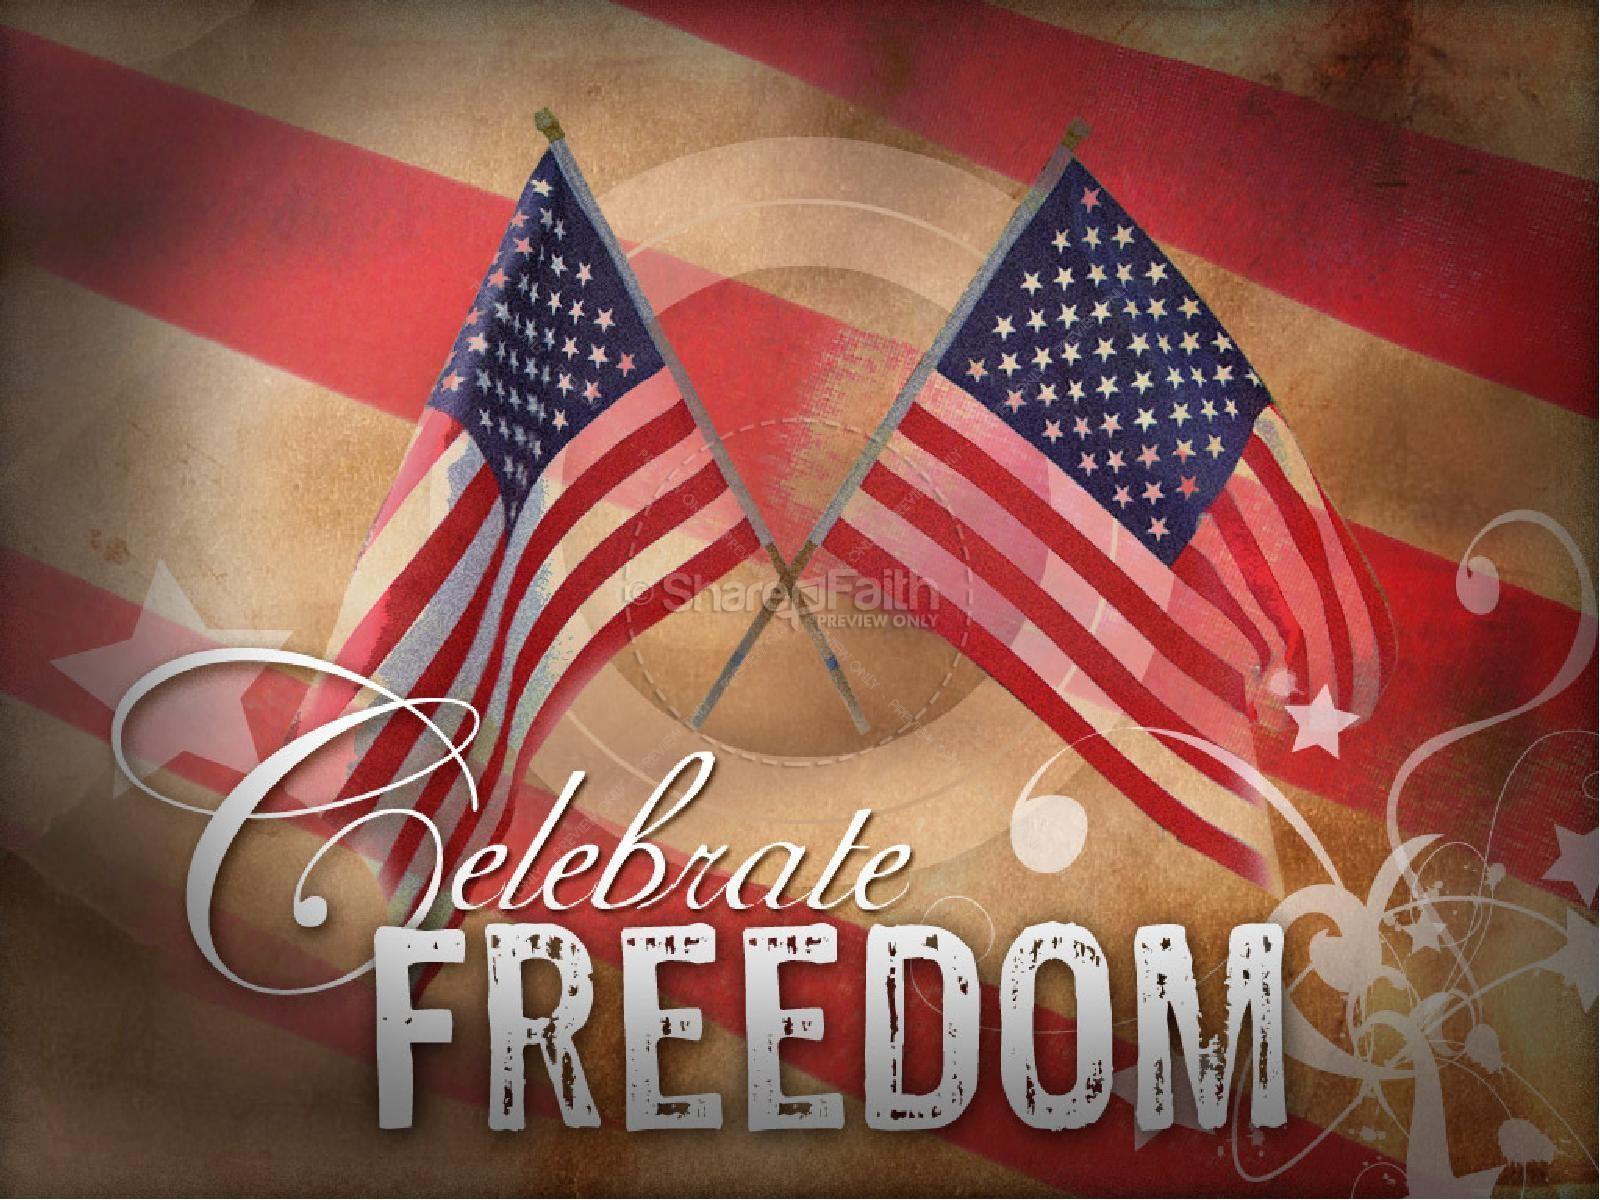 Celebrate Freedom | slide 1